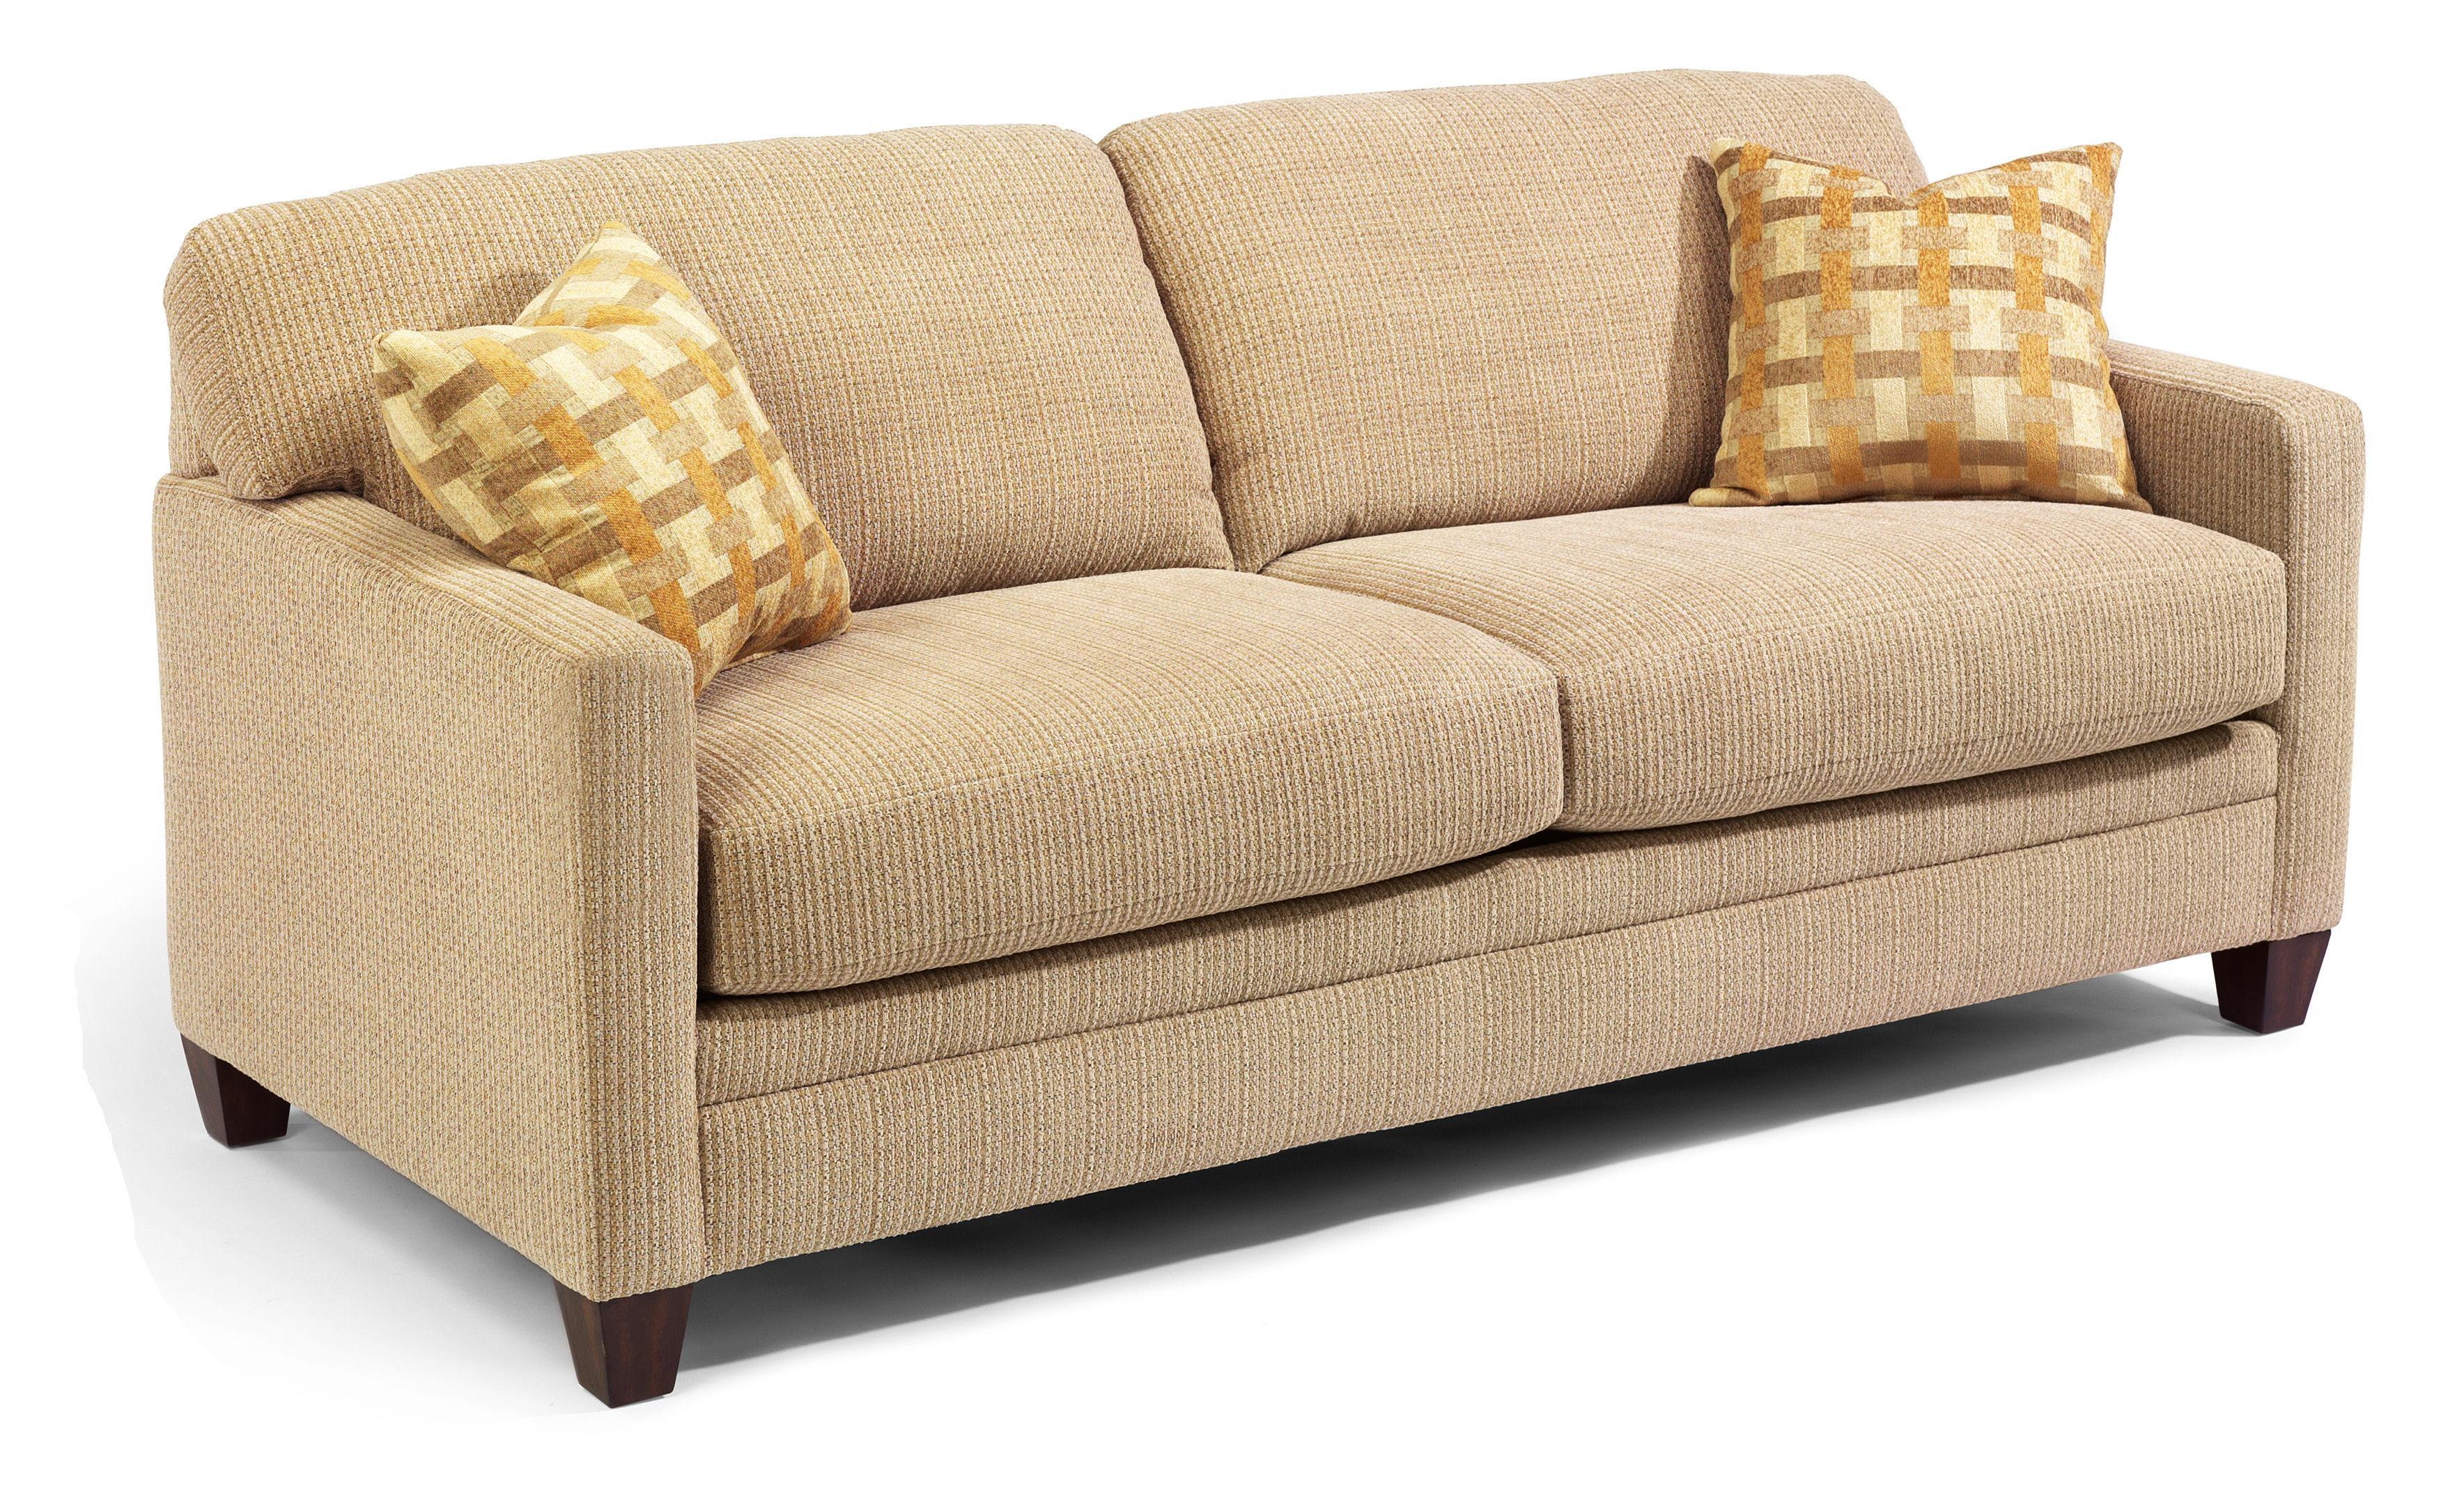 Serendipity Upholstered Sofa Sleeper by Flexsteel at Steger's Furniture